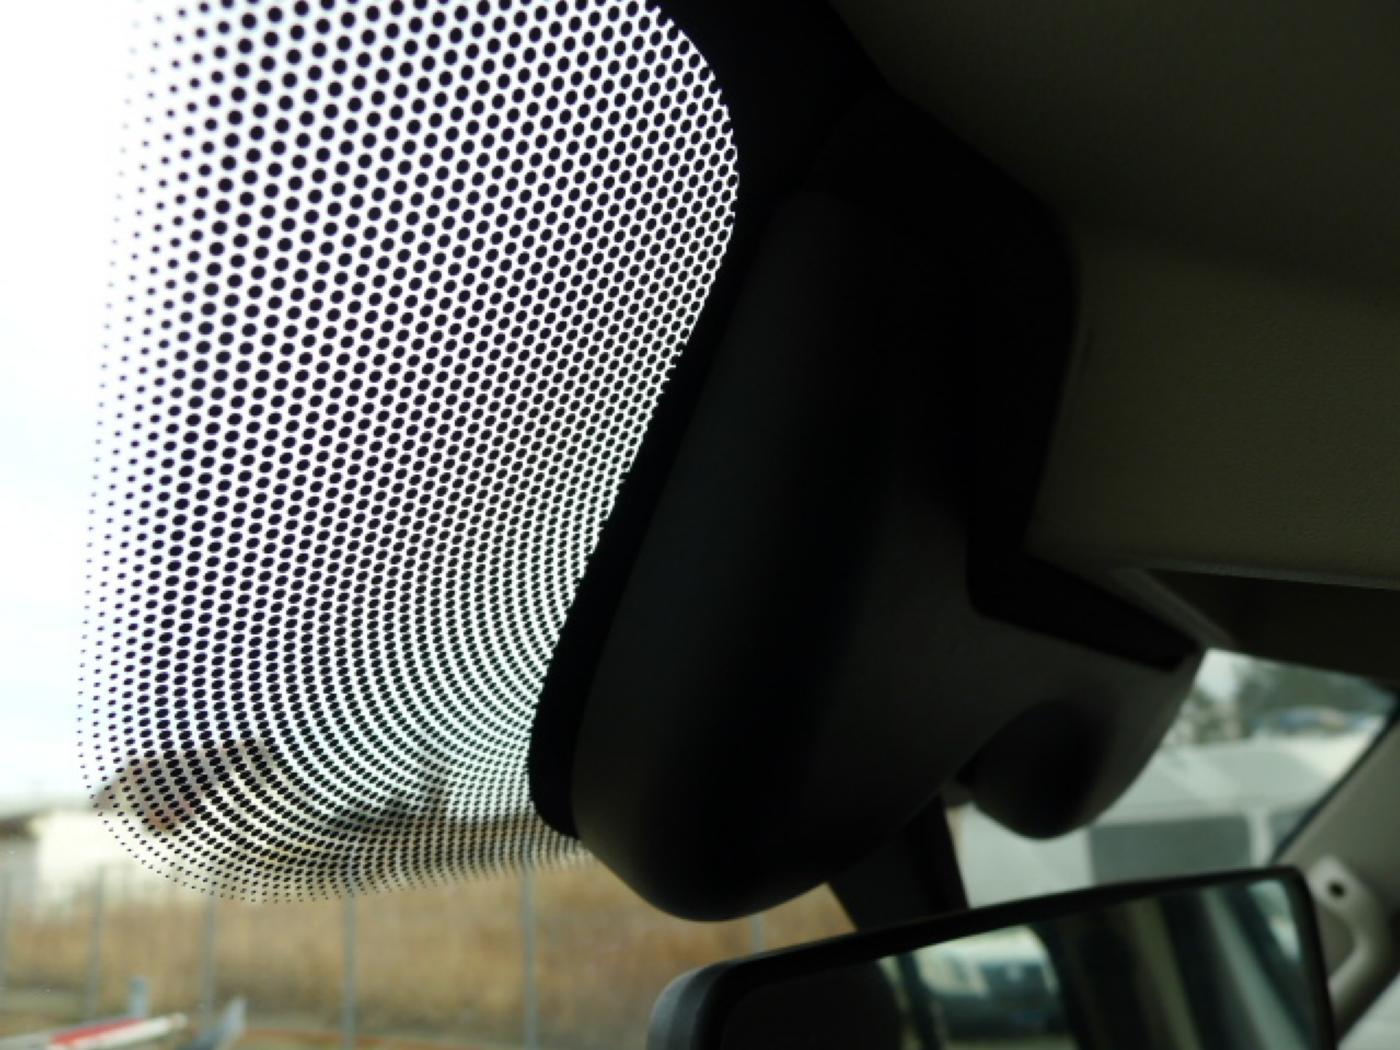 Peugeot Boxer 2,2 HDI PANORAMA 8míst+2 x klima+We - 18